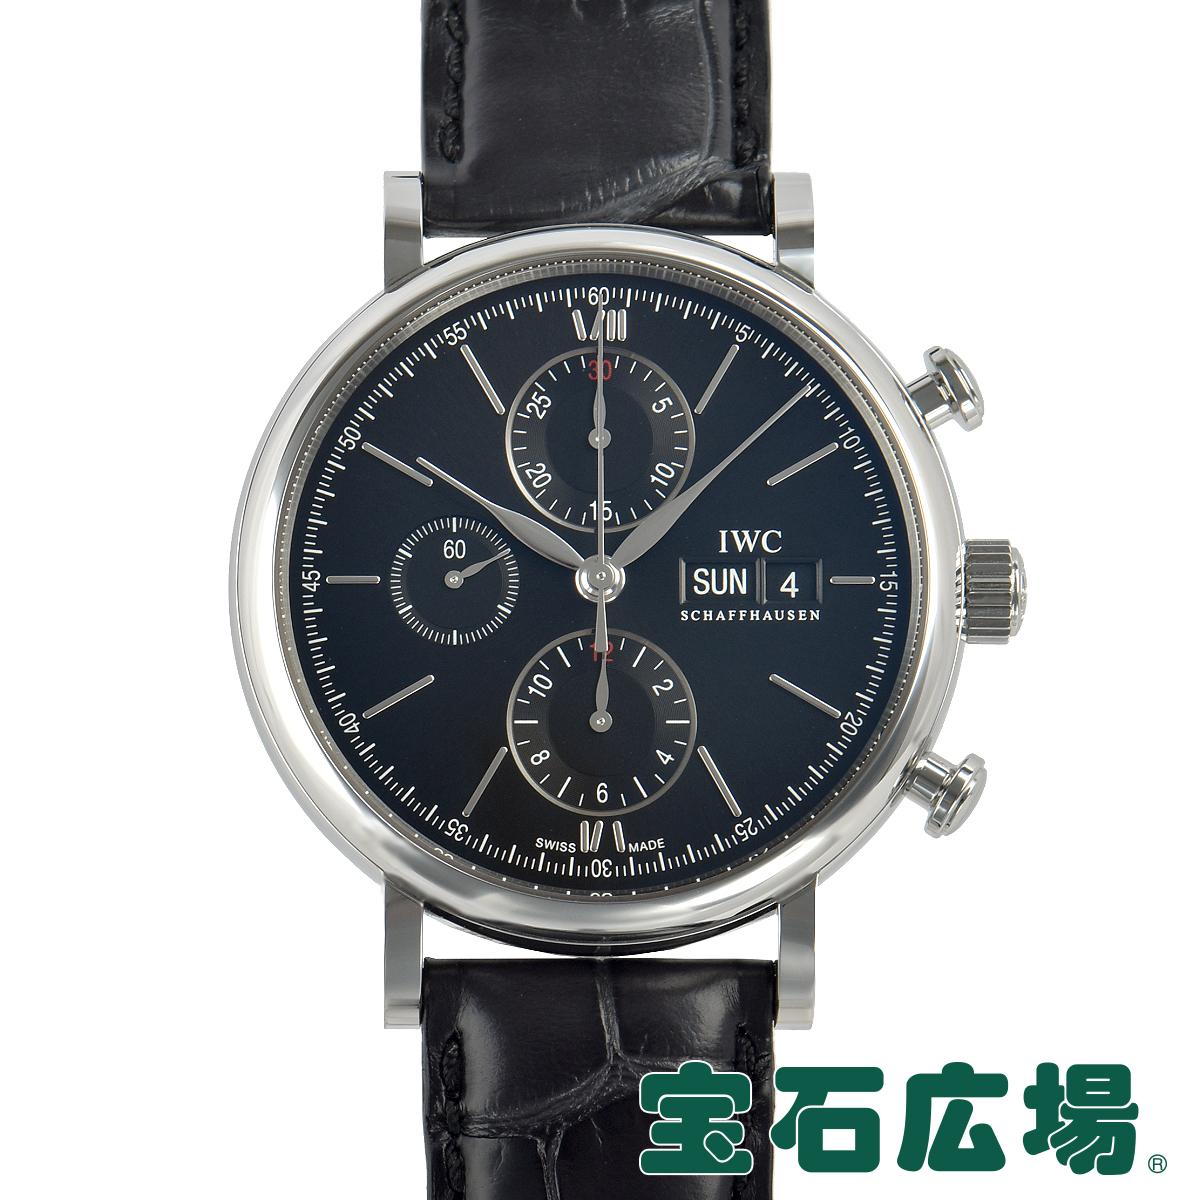 IWC (アイ・ダブリュー・シー) ポートフィノ クロノ IW391029【新品】メンズ 腕時計 送料・代引手数料無料